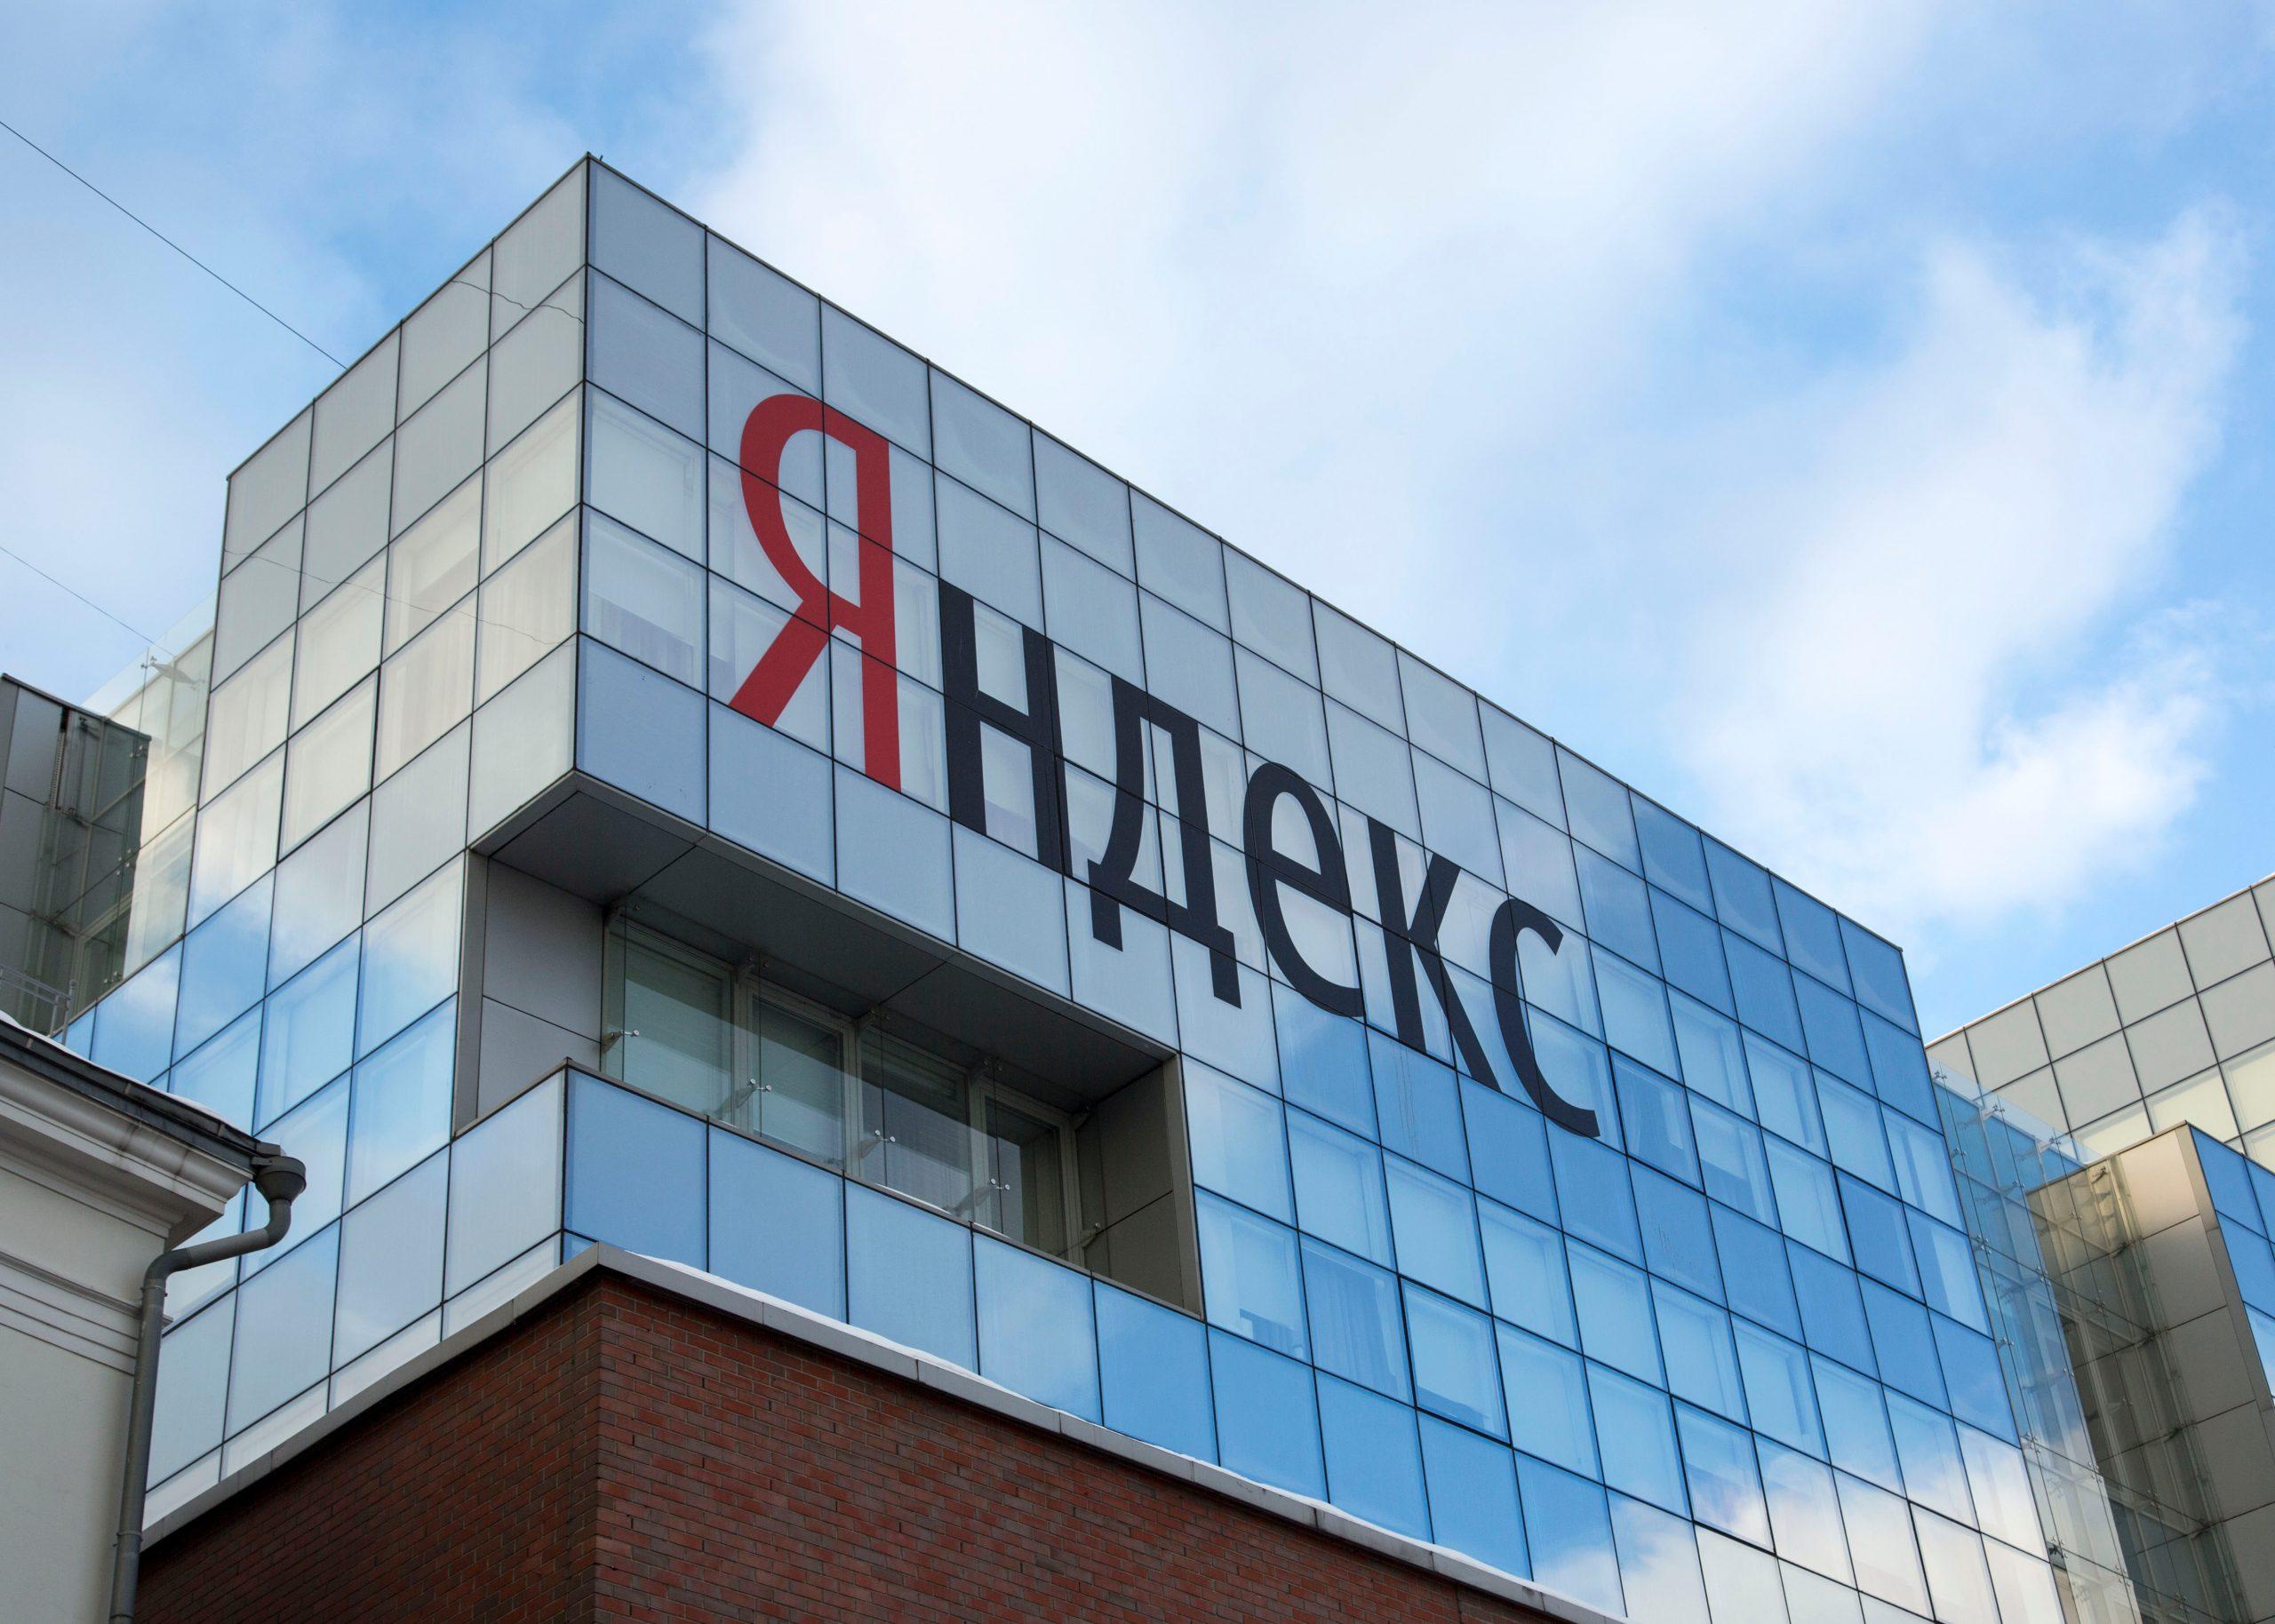 Yandex hq